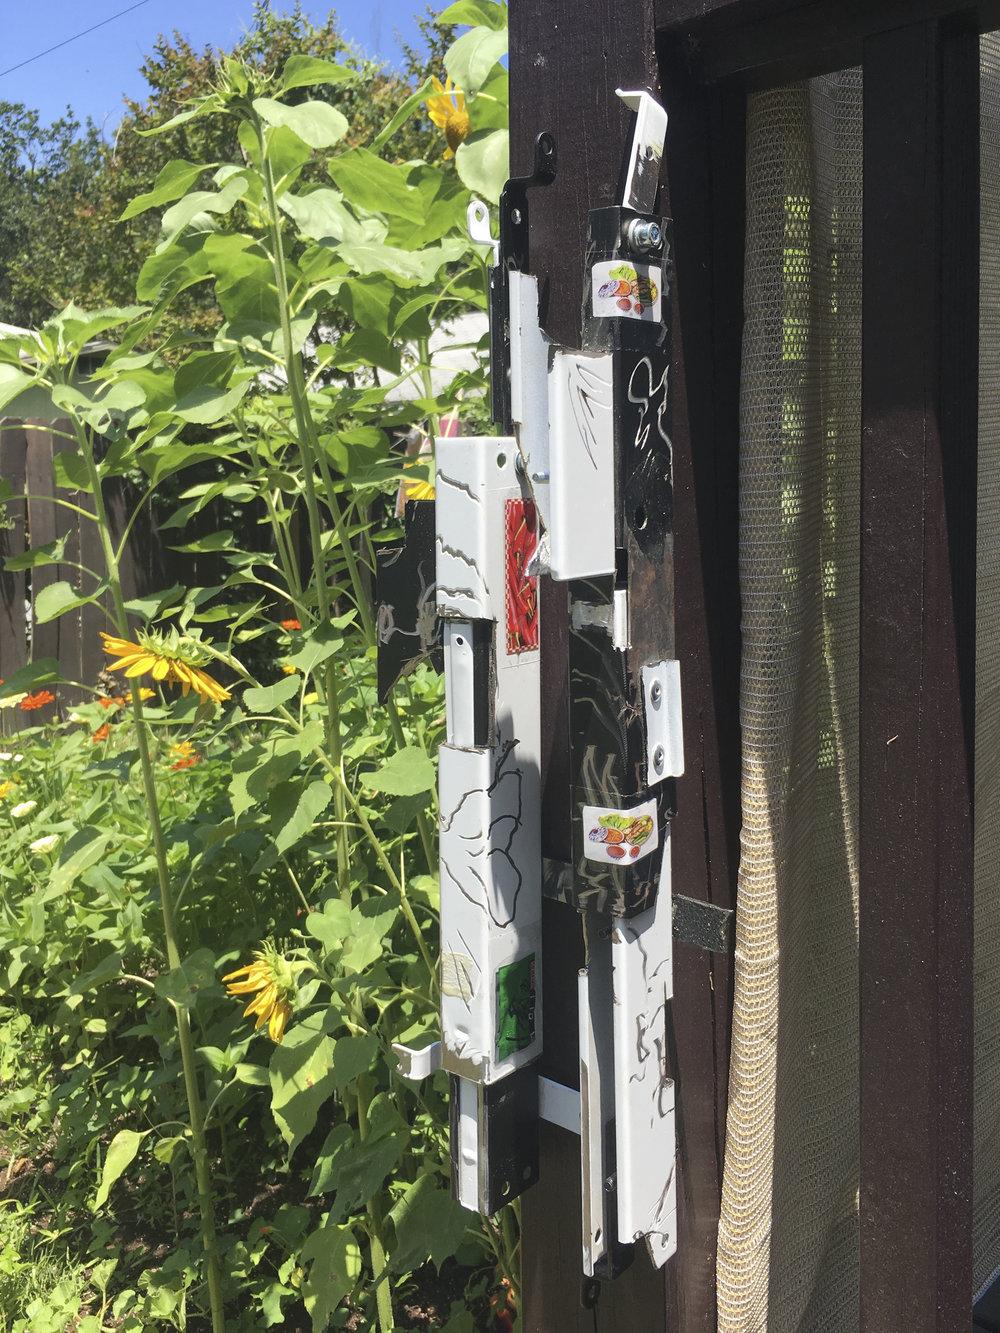 "Nathan Ellefson    skunkcore/originalchapstik/secondhandcopcar   modified projector mounts, food packaging, tape  9"" x 22"" x 4"", 2018"